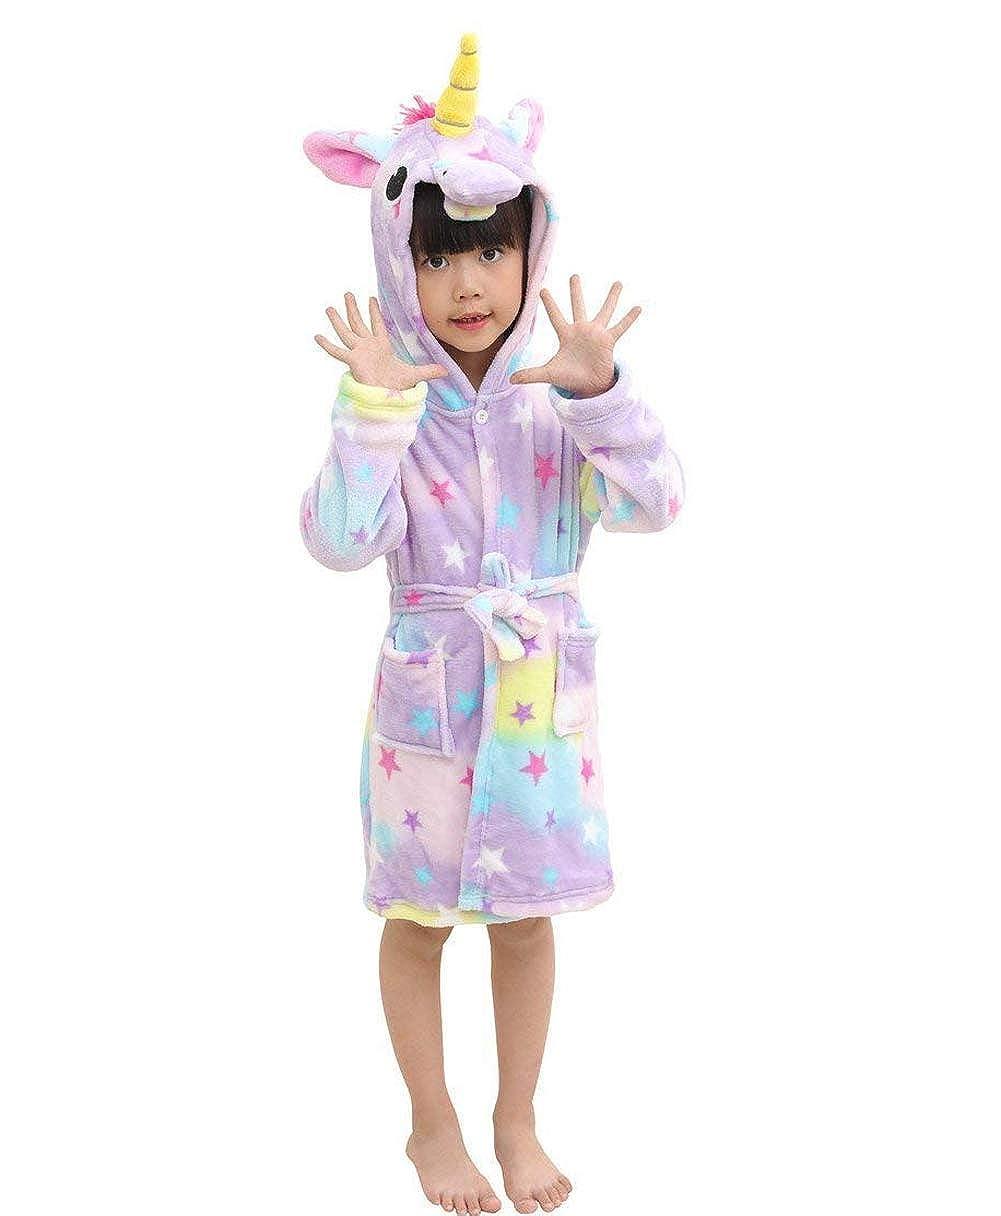 AooToo Kids Bathrobe Flannel Cartoon Unicorn Hooded Nightwear Unisex Soft Loungewear